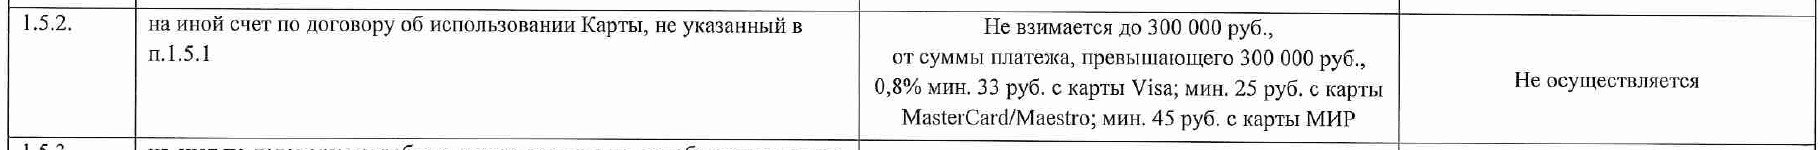 debet%20karta%20polza_13.jpg